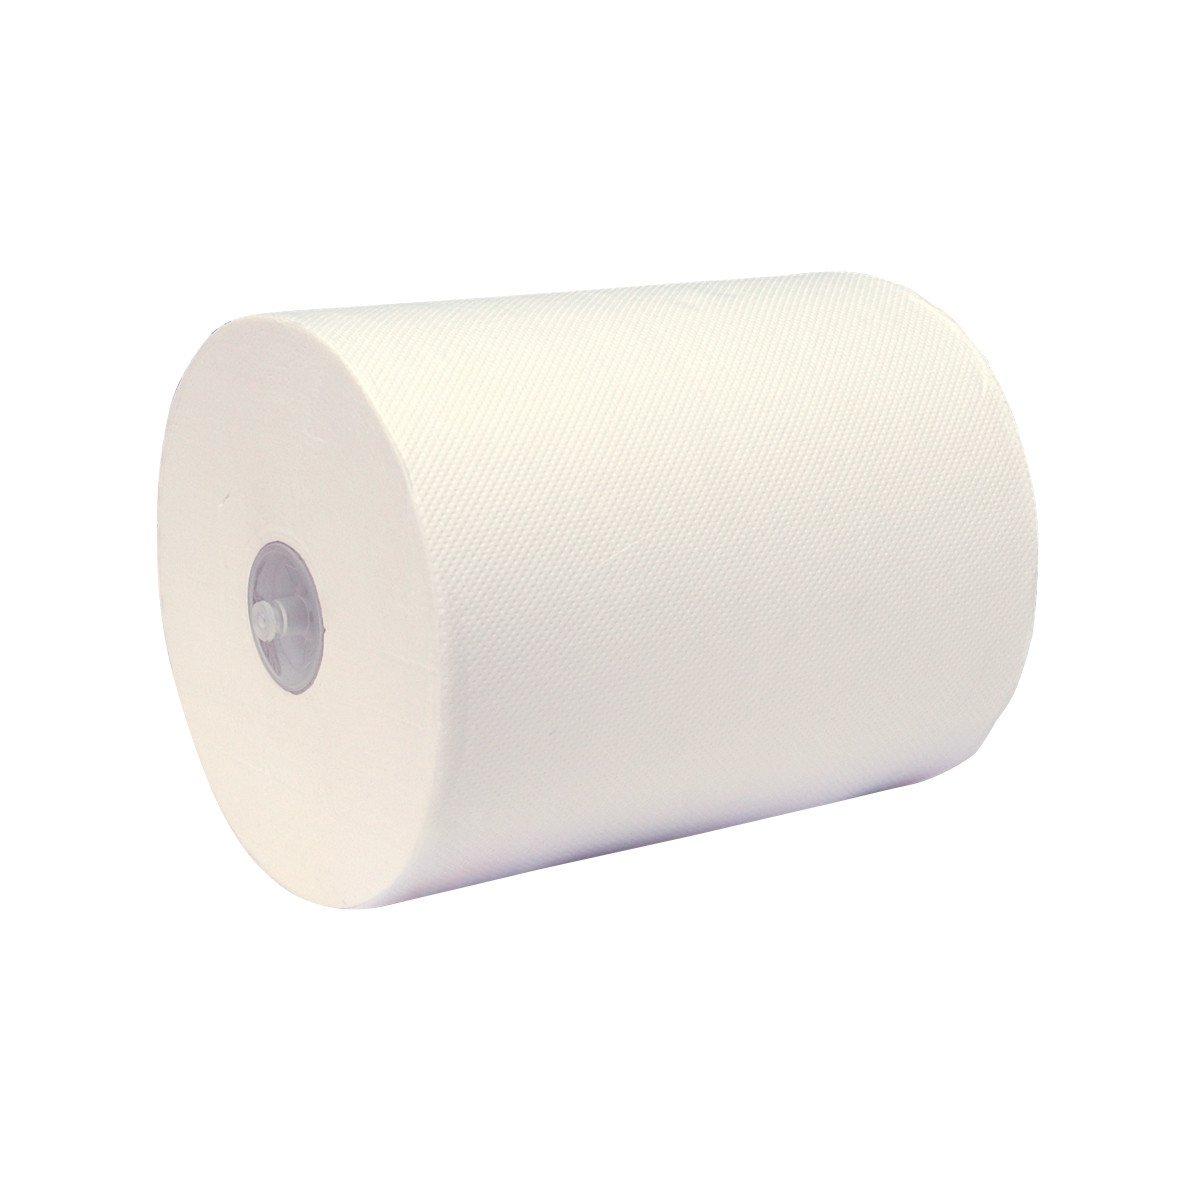 Euro Products | Handdoekrol | Ultimatic | Cellulose verlijmd | 6 x 130 meter